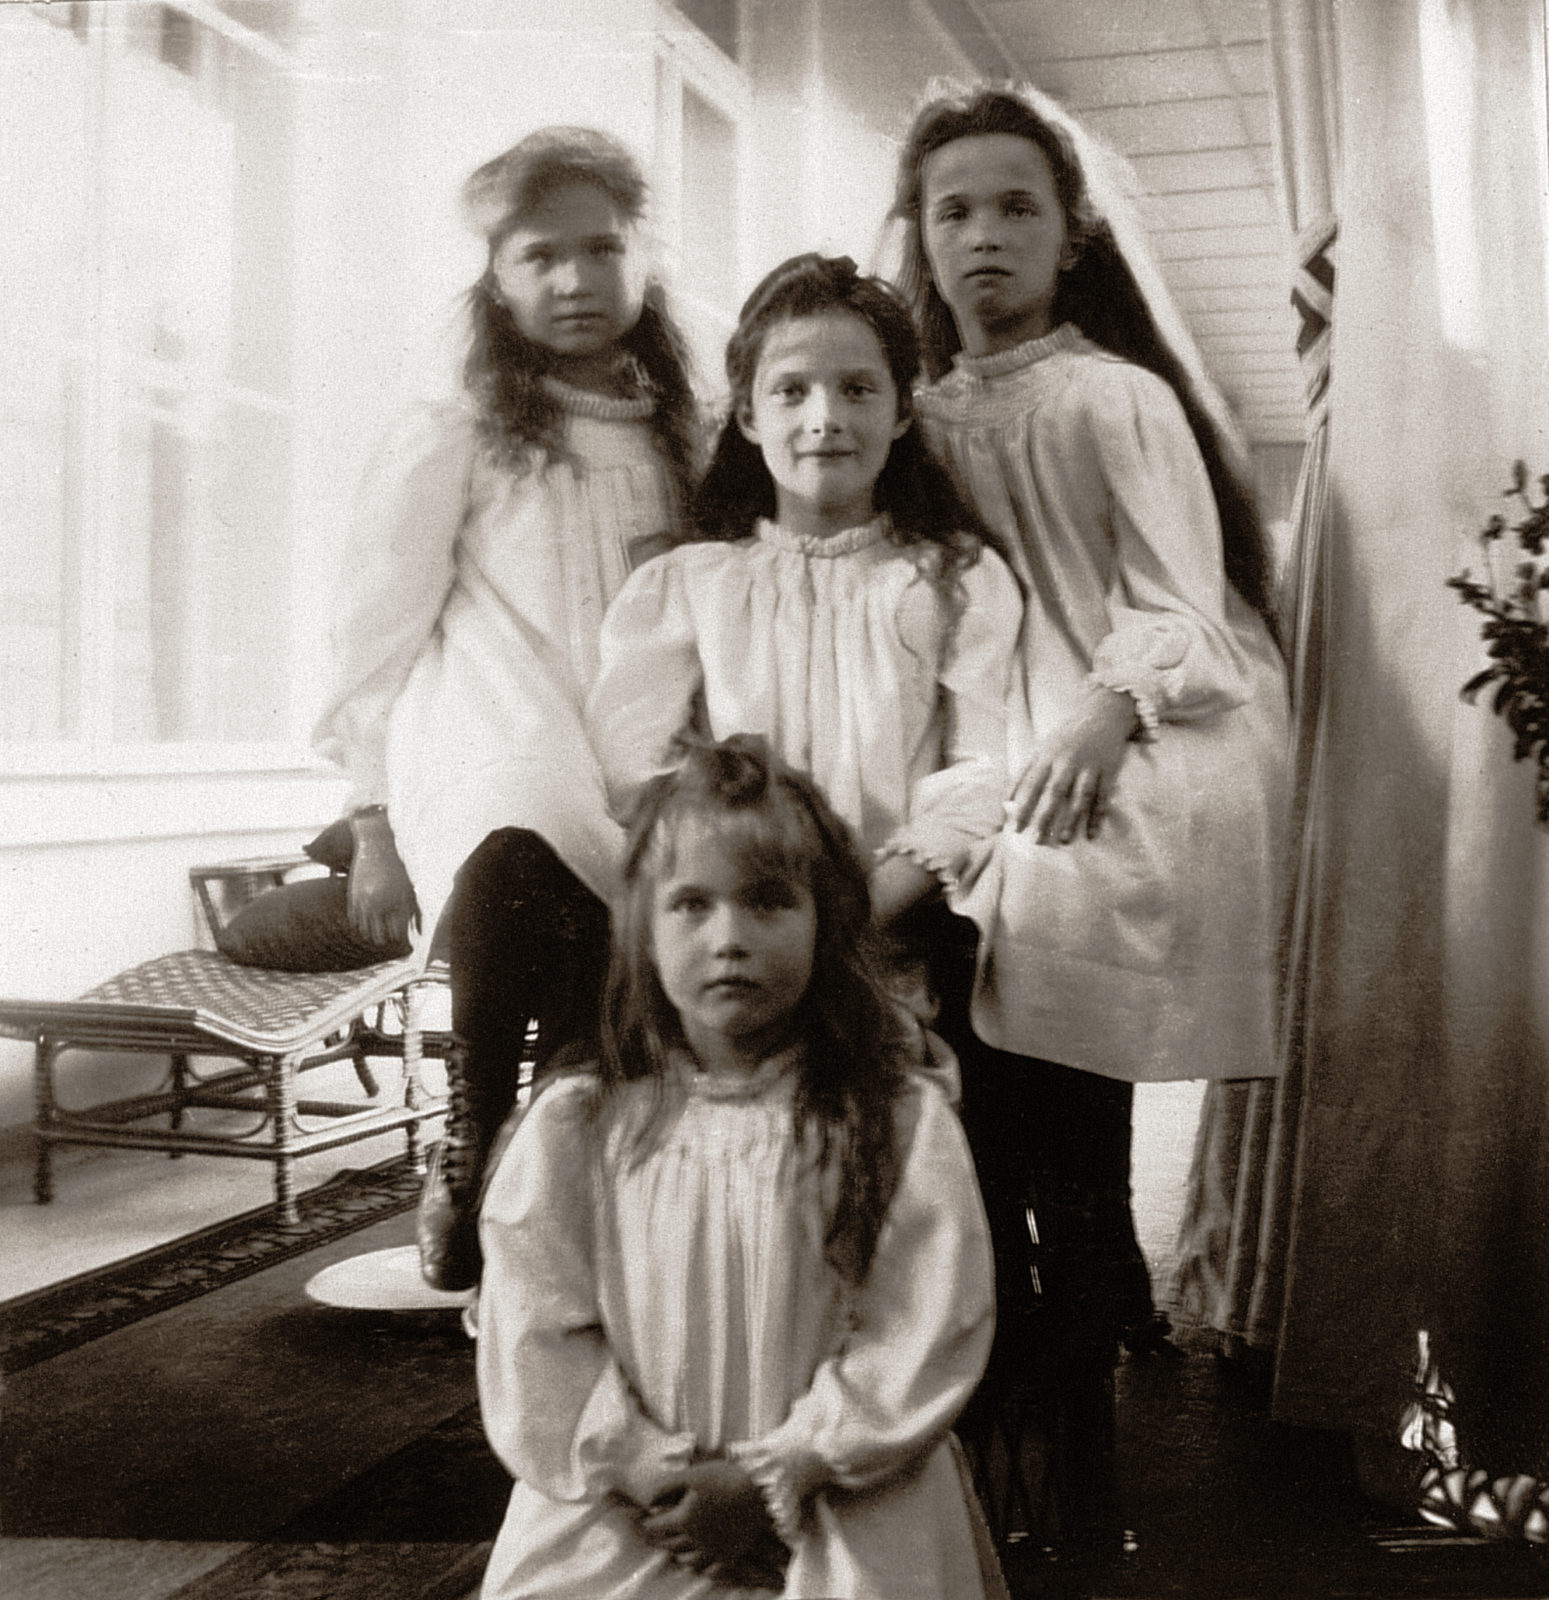 The Grand Duchesses Olga, Tatiana, Maria and Anastasia. Daughters of Emperor Nicholas II and Empress Alexandra Feodorovna. Photo of 1905-1906.